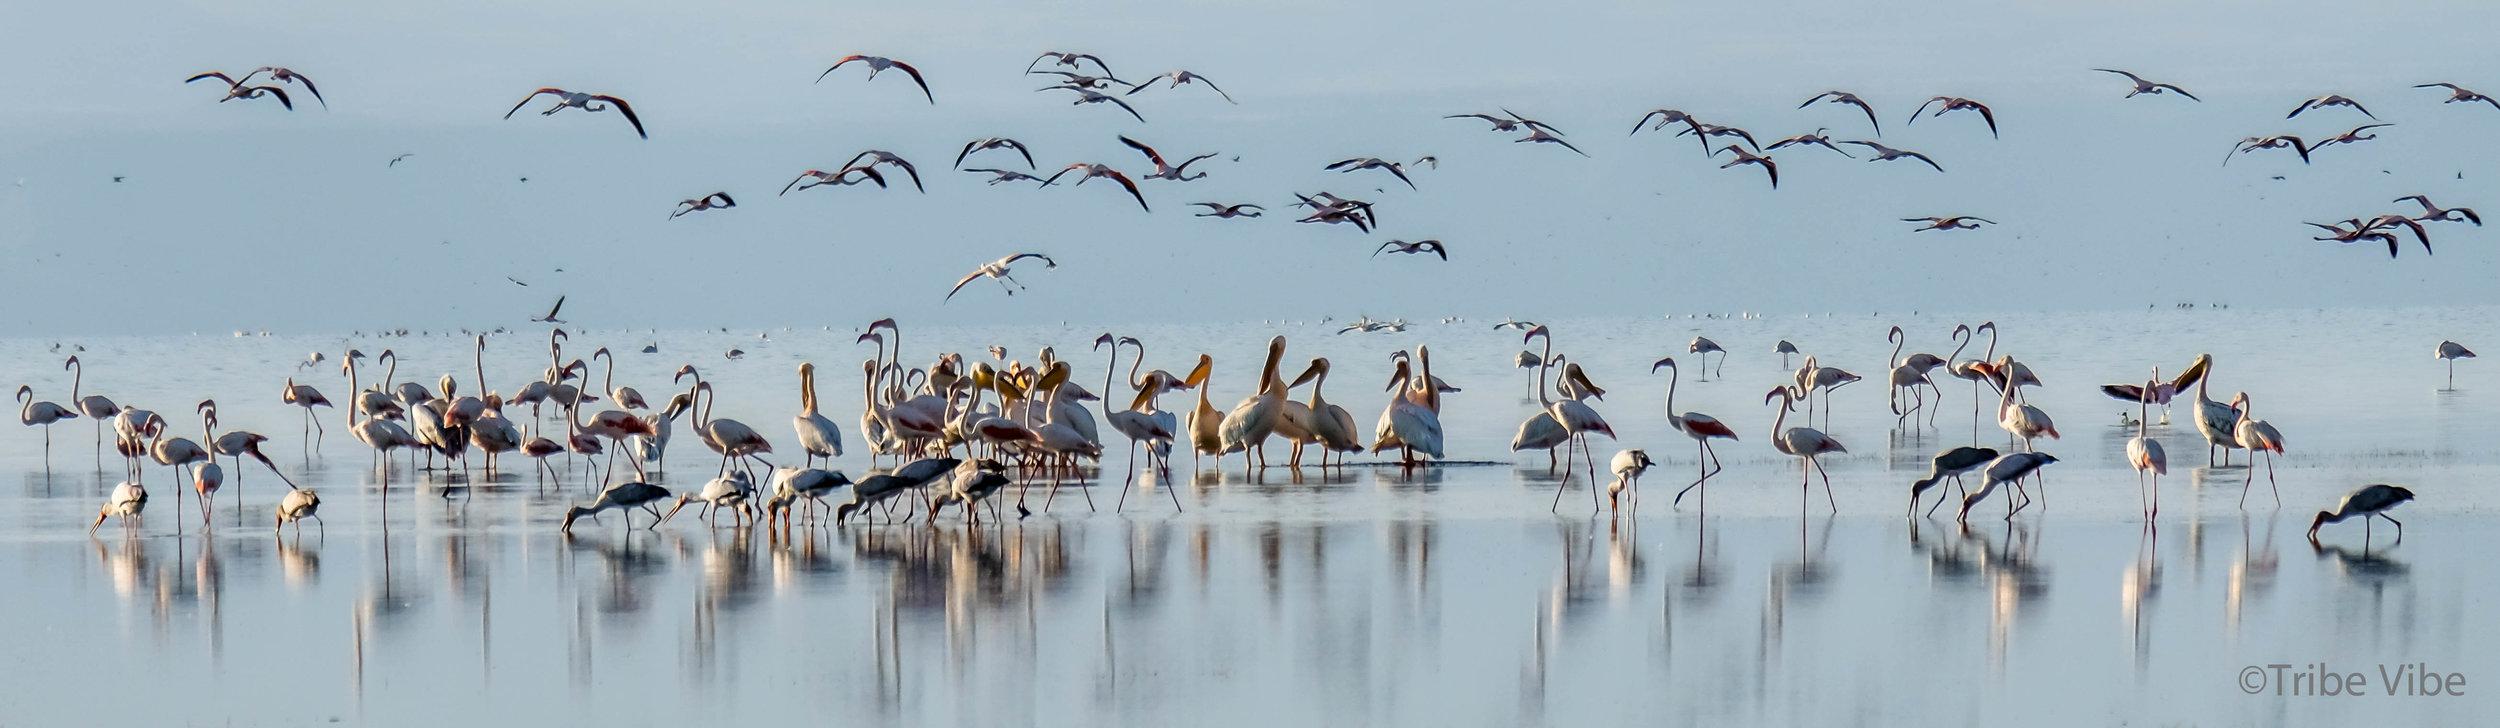 Lake Manyara birds, Tanzania34.jpg